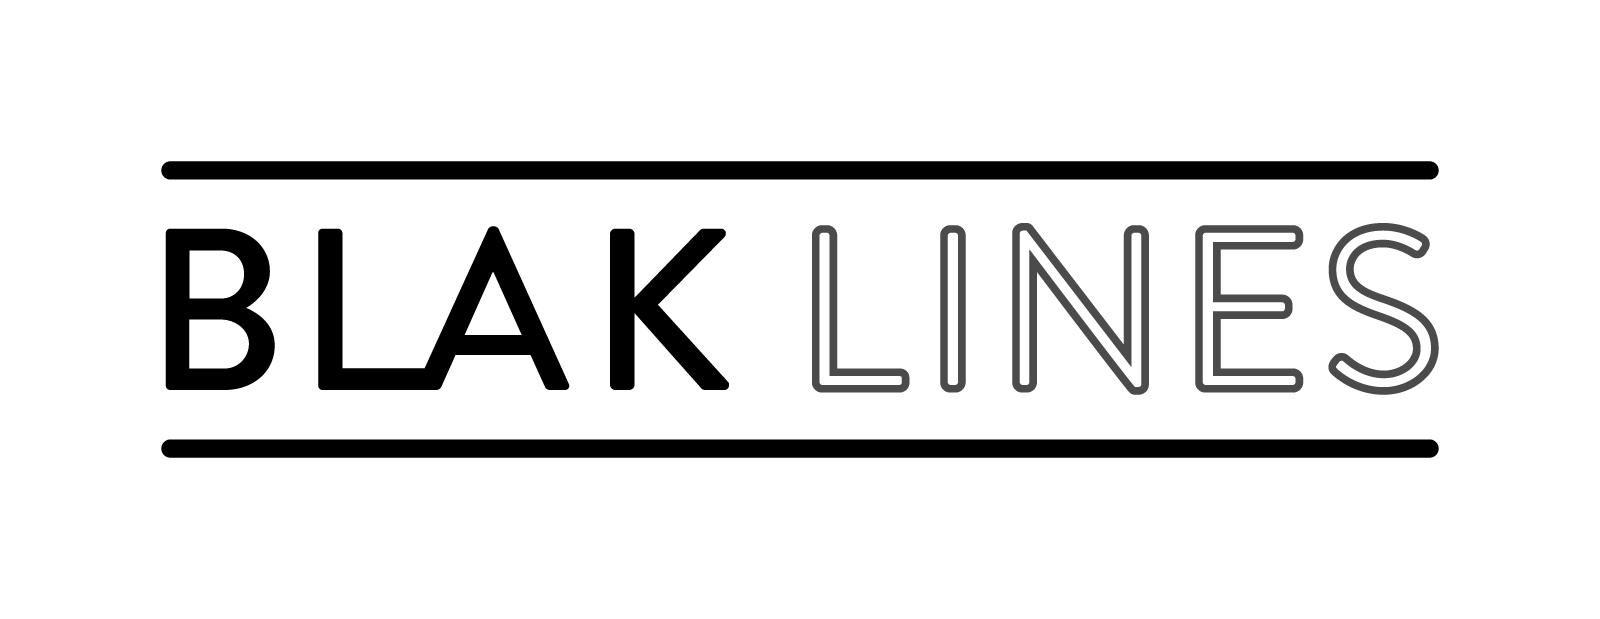 blake lines